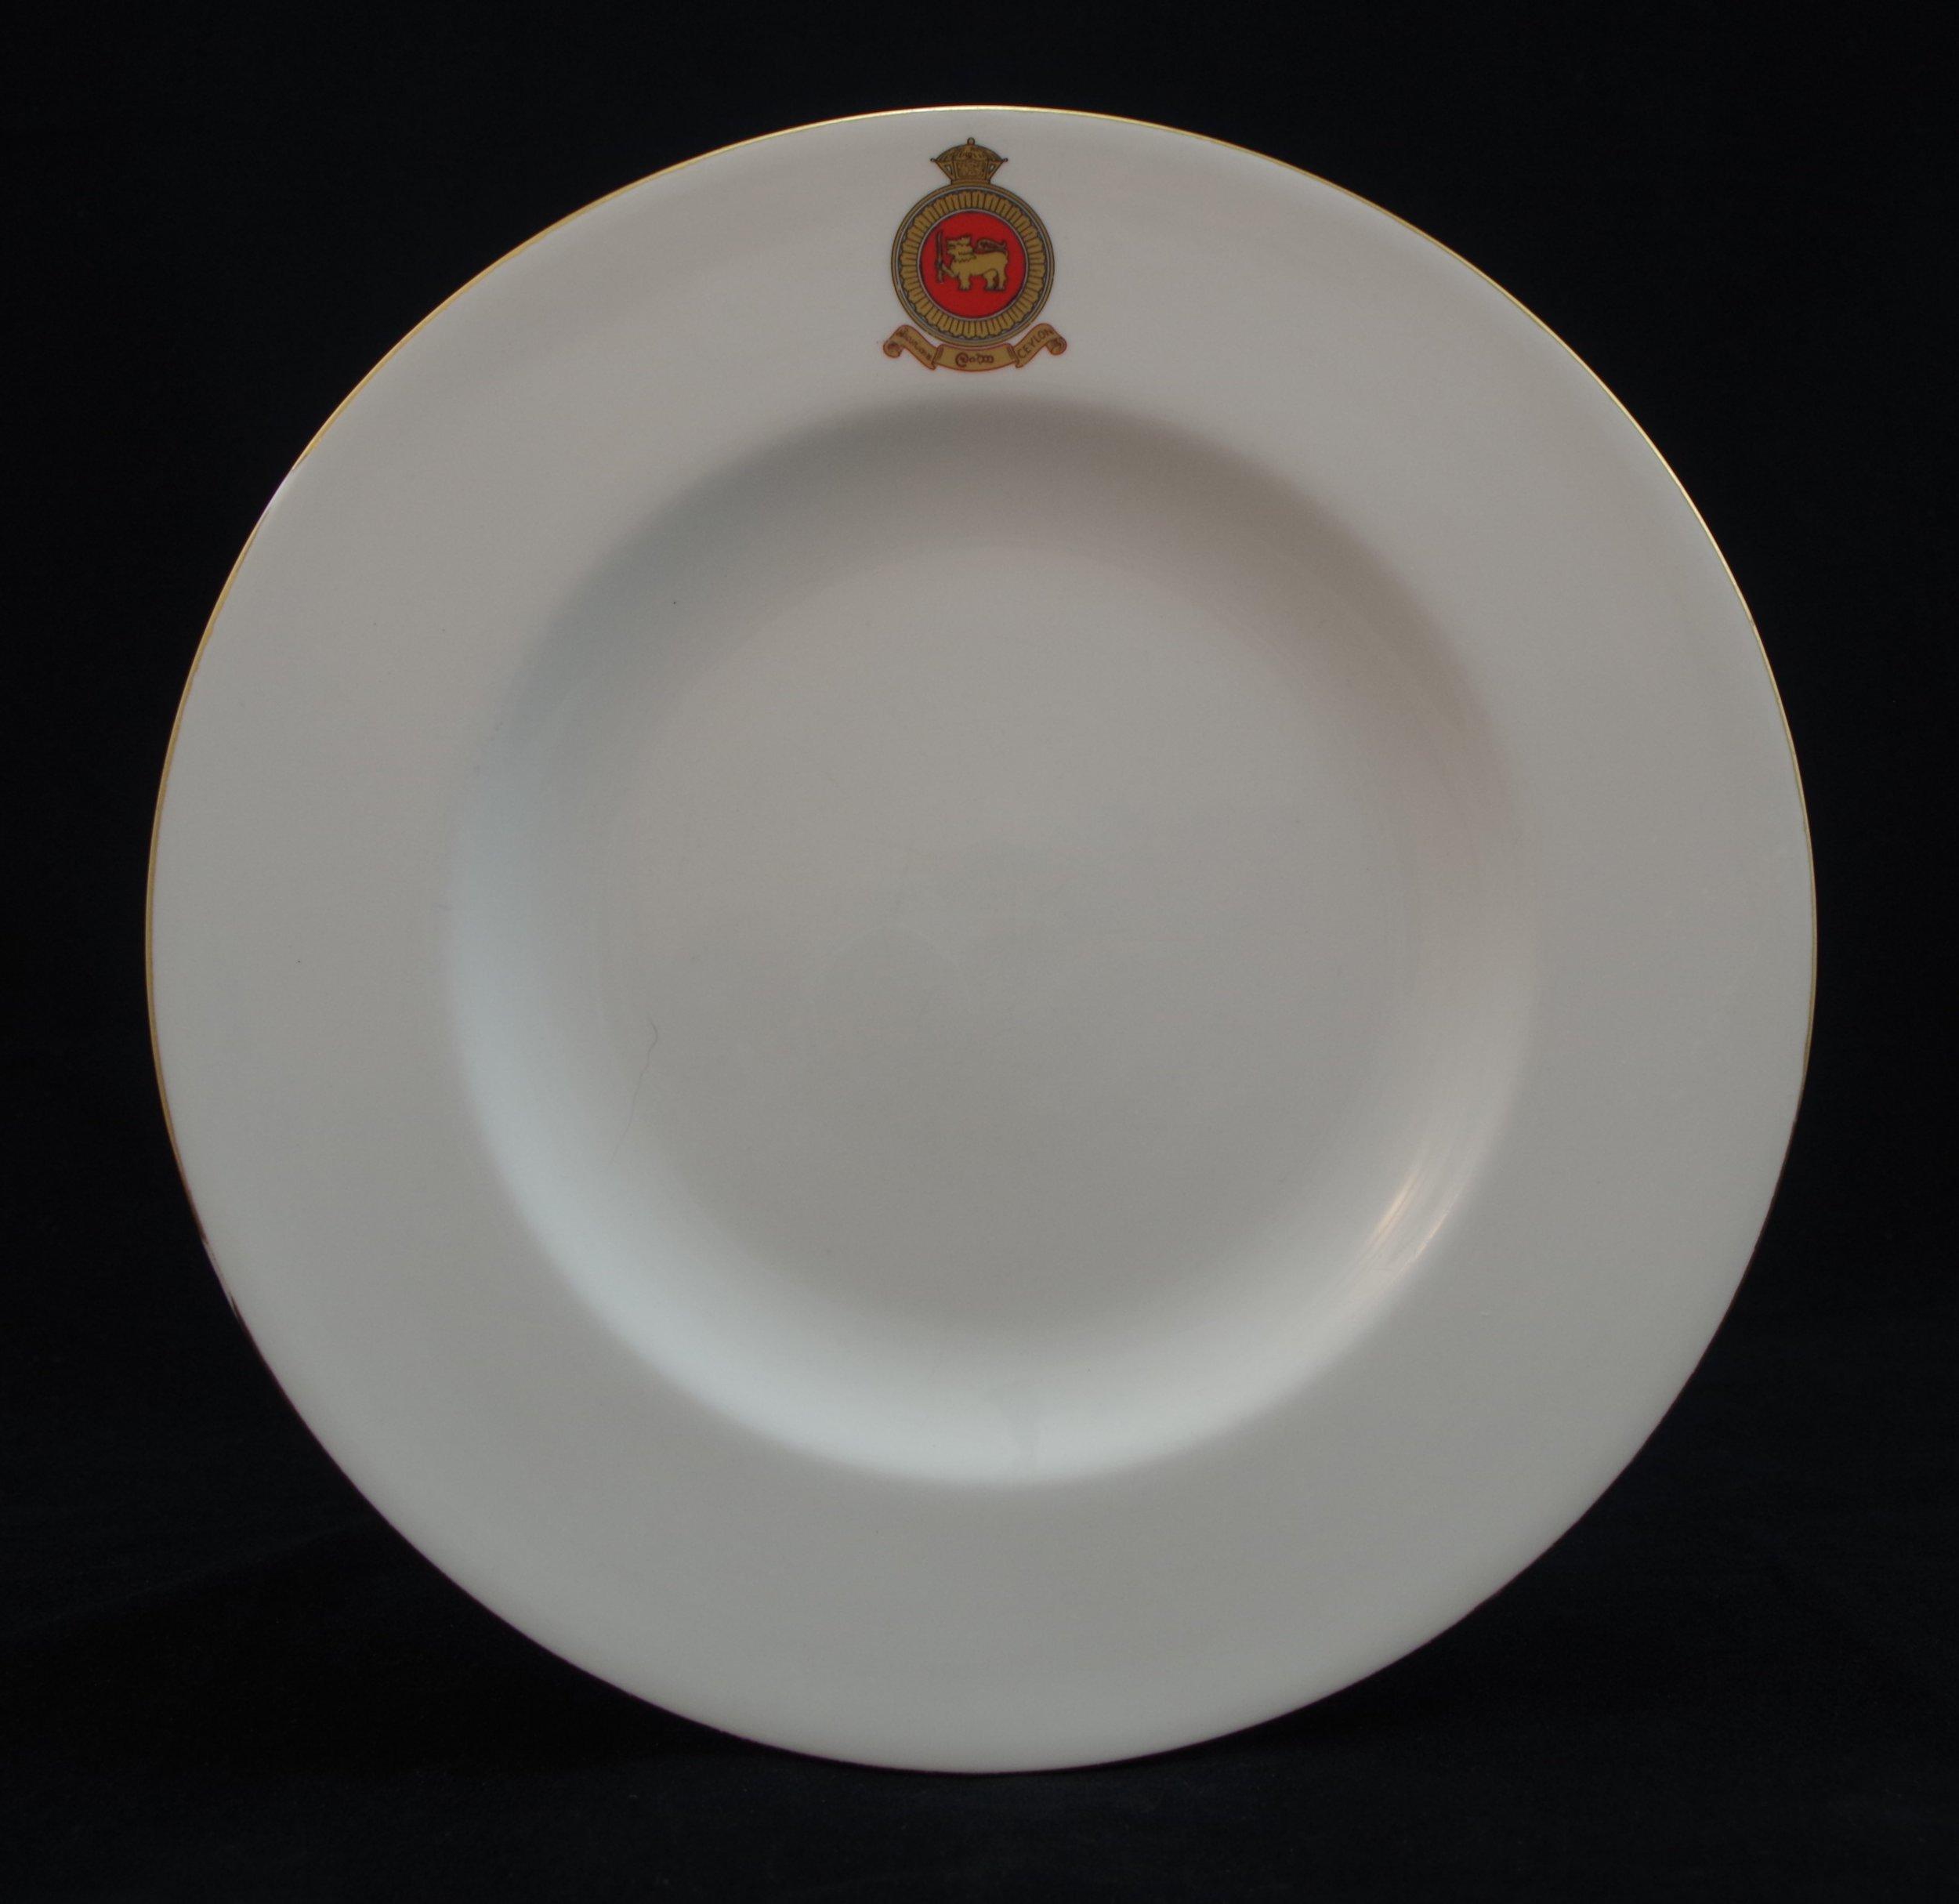 royal-crown-derby-plain-shape-ceylon